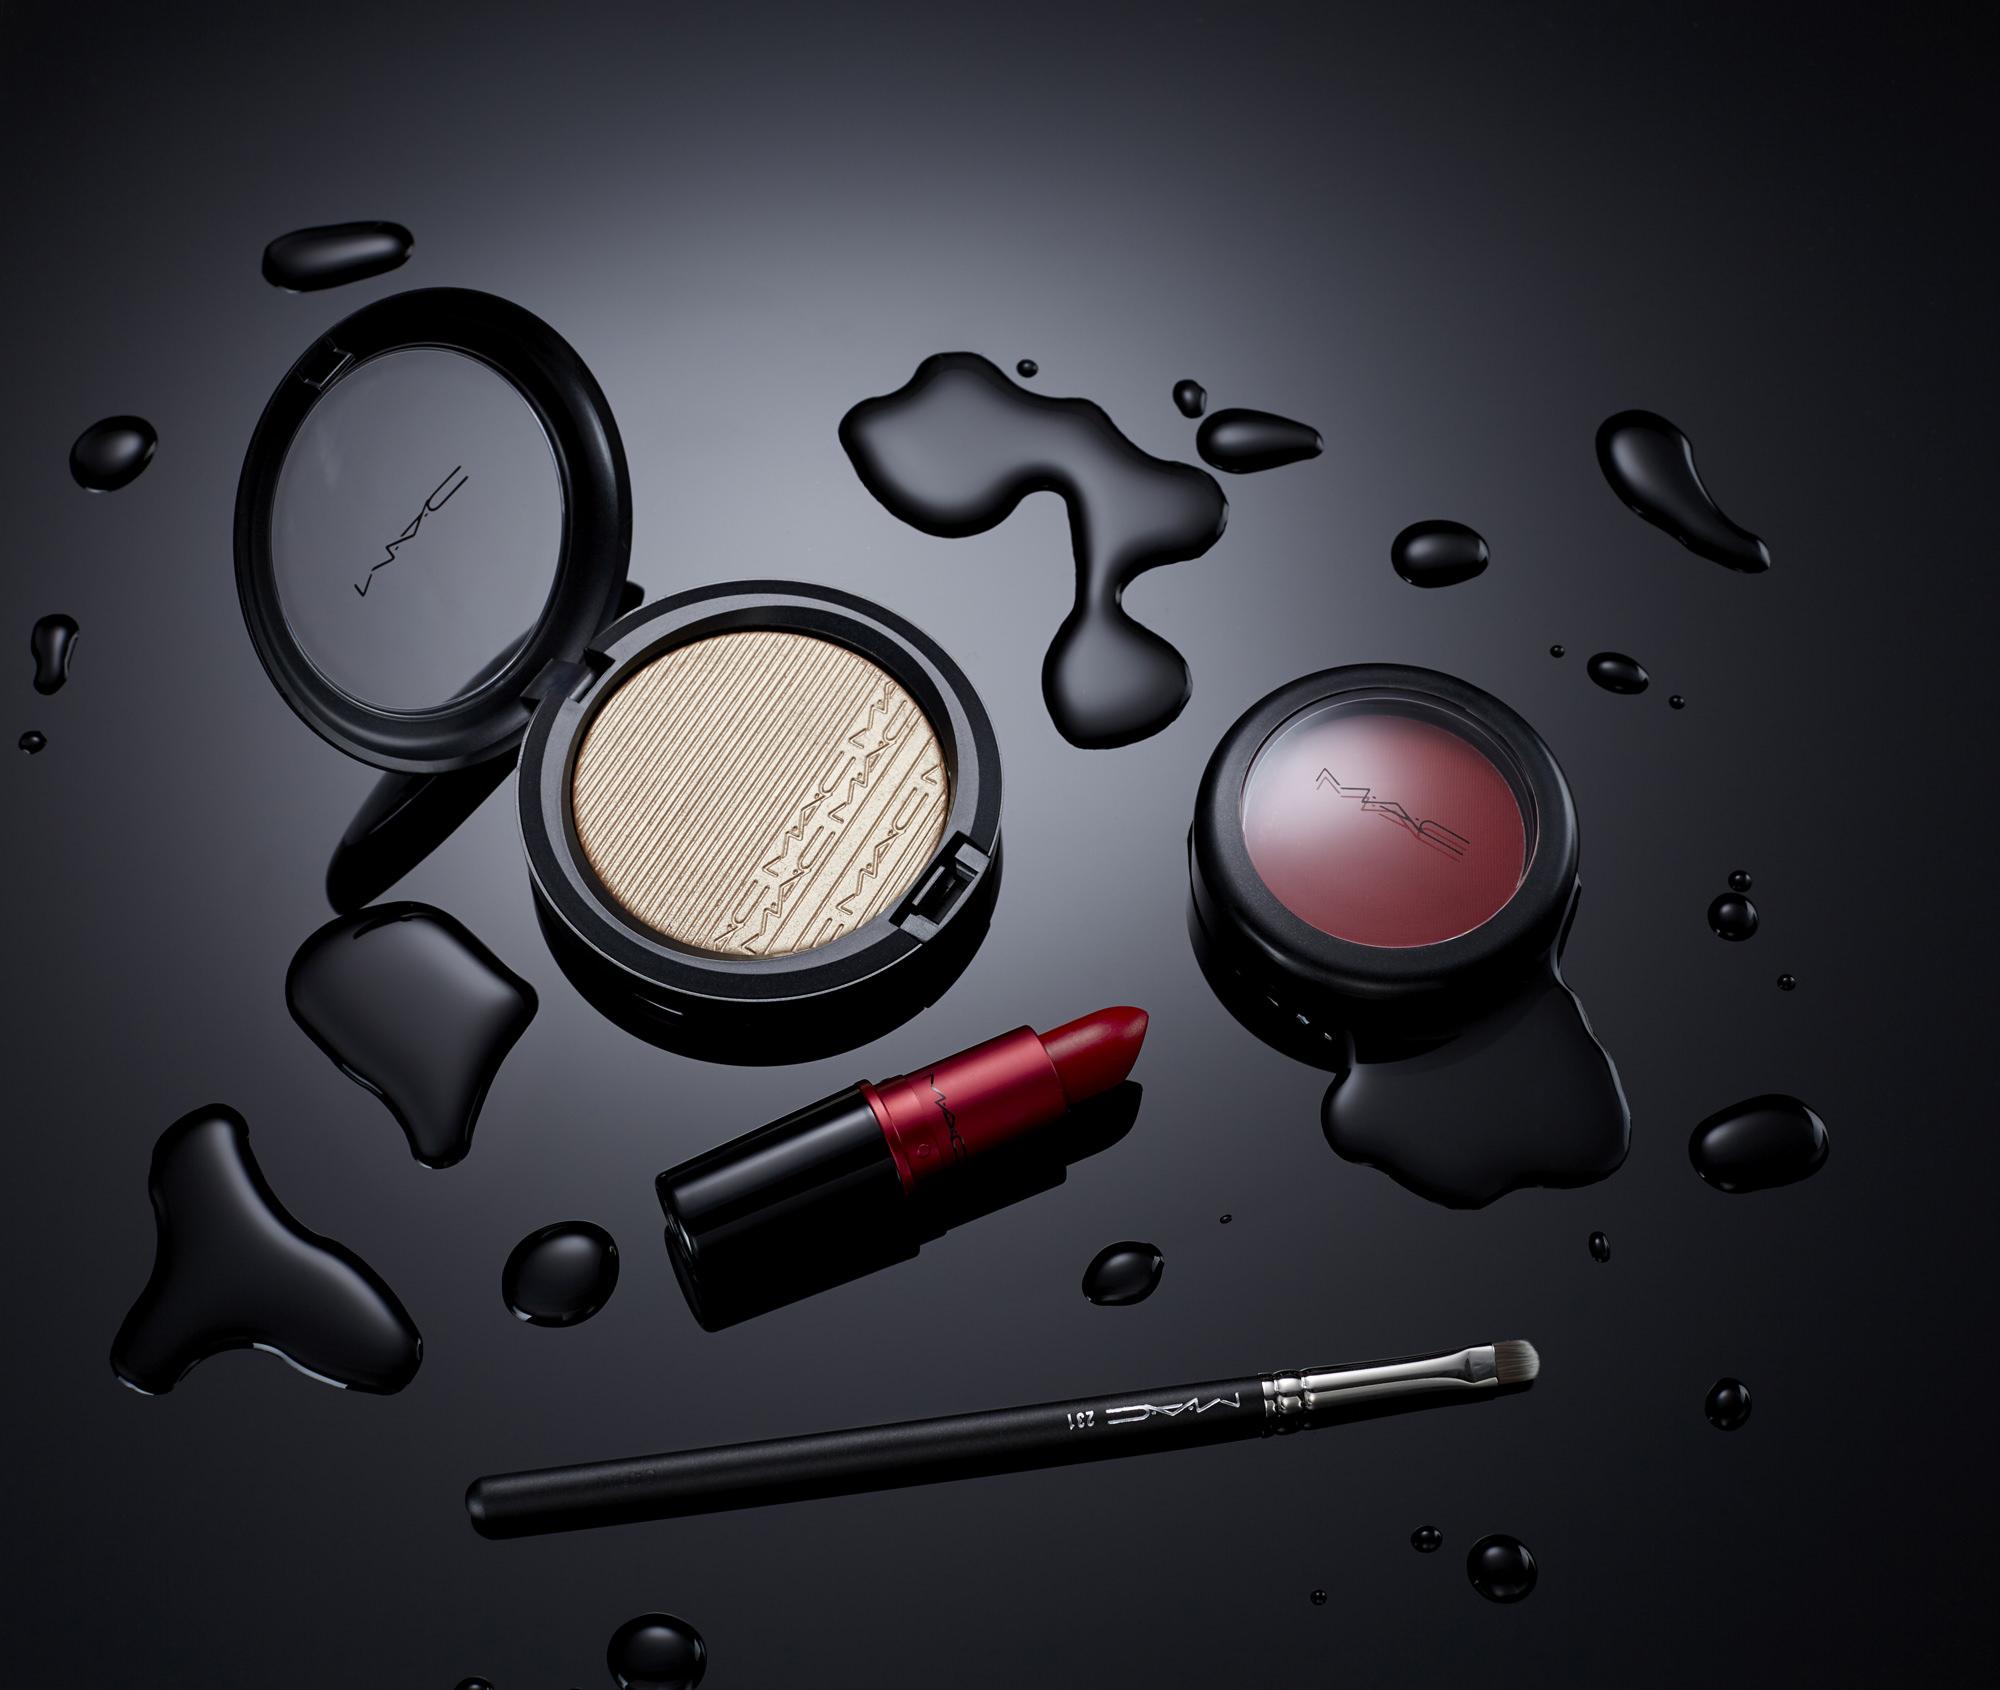 cosmetics-photography-winslett-media-group-01.jpg